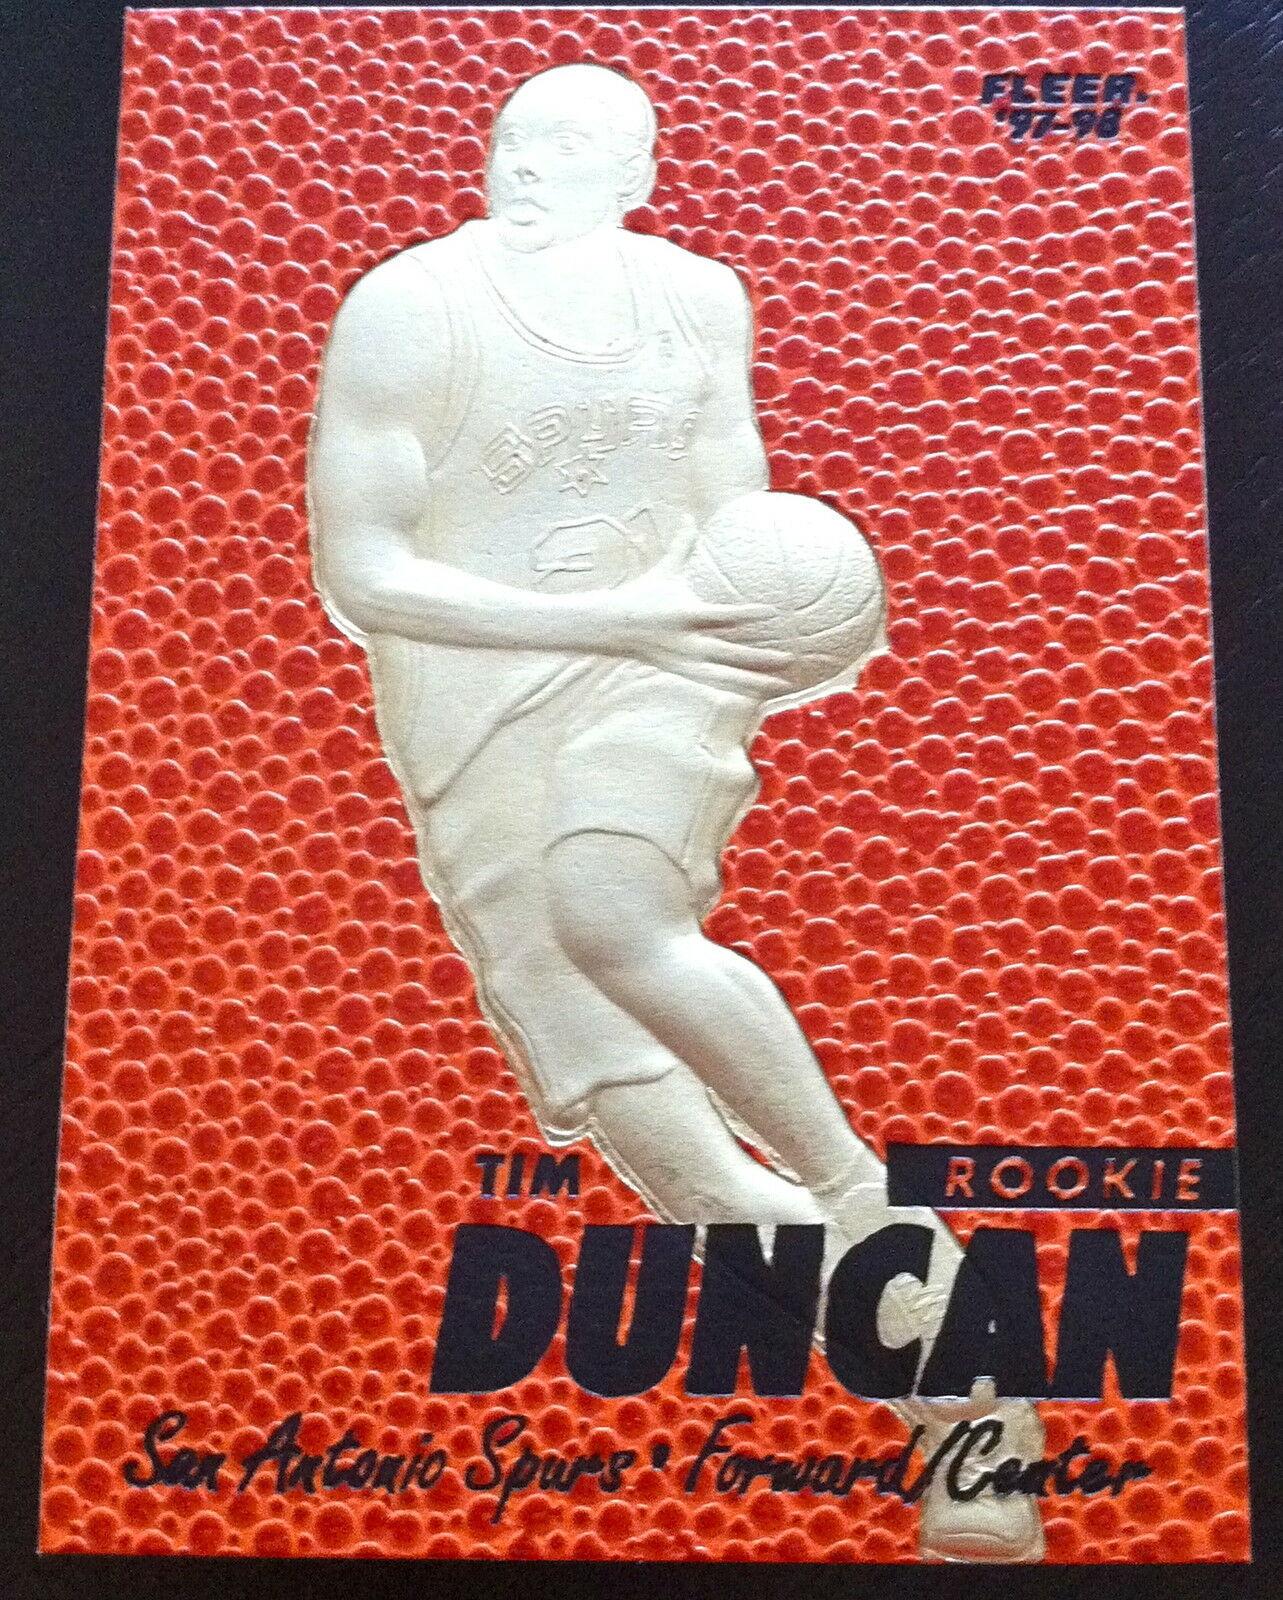 Tim Duncan 1997-98 Fleer 23KT or Édition Limitée Carte Rookie! 5X NBA Champion !